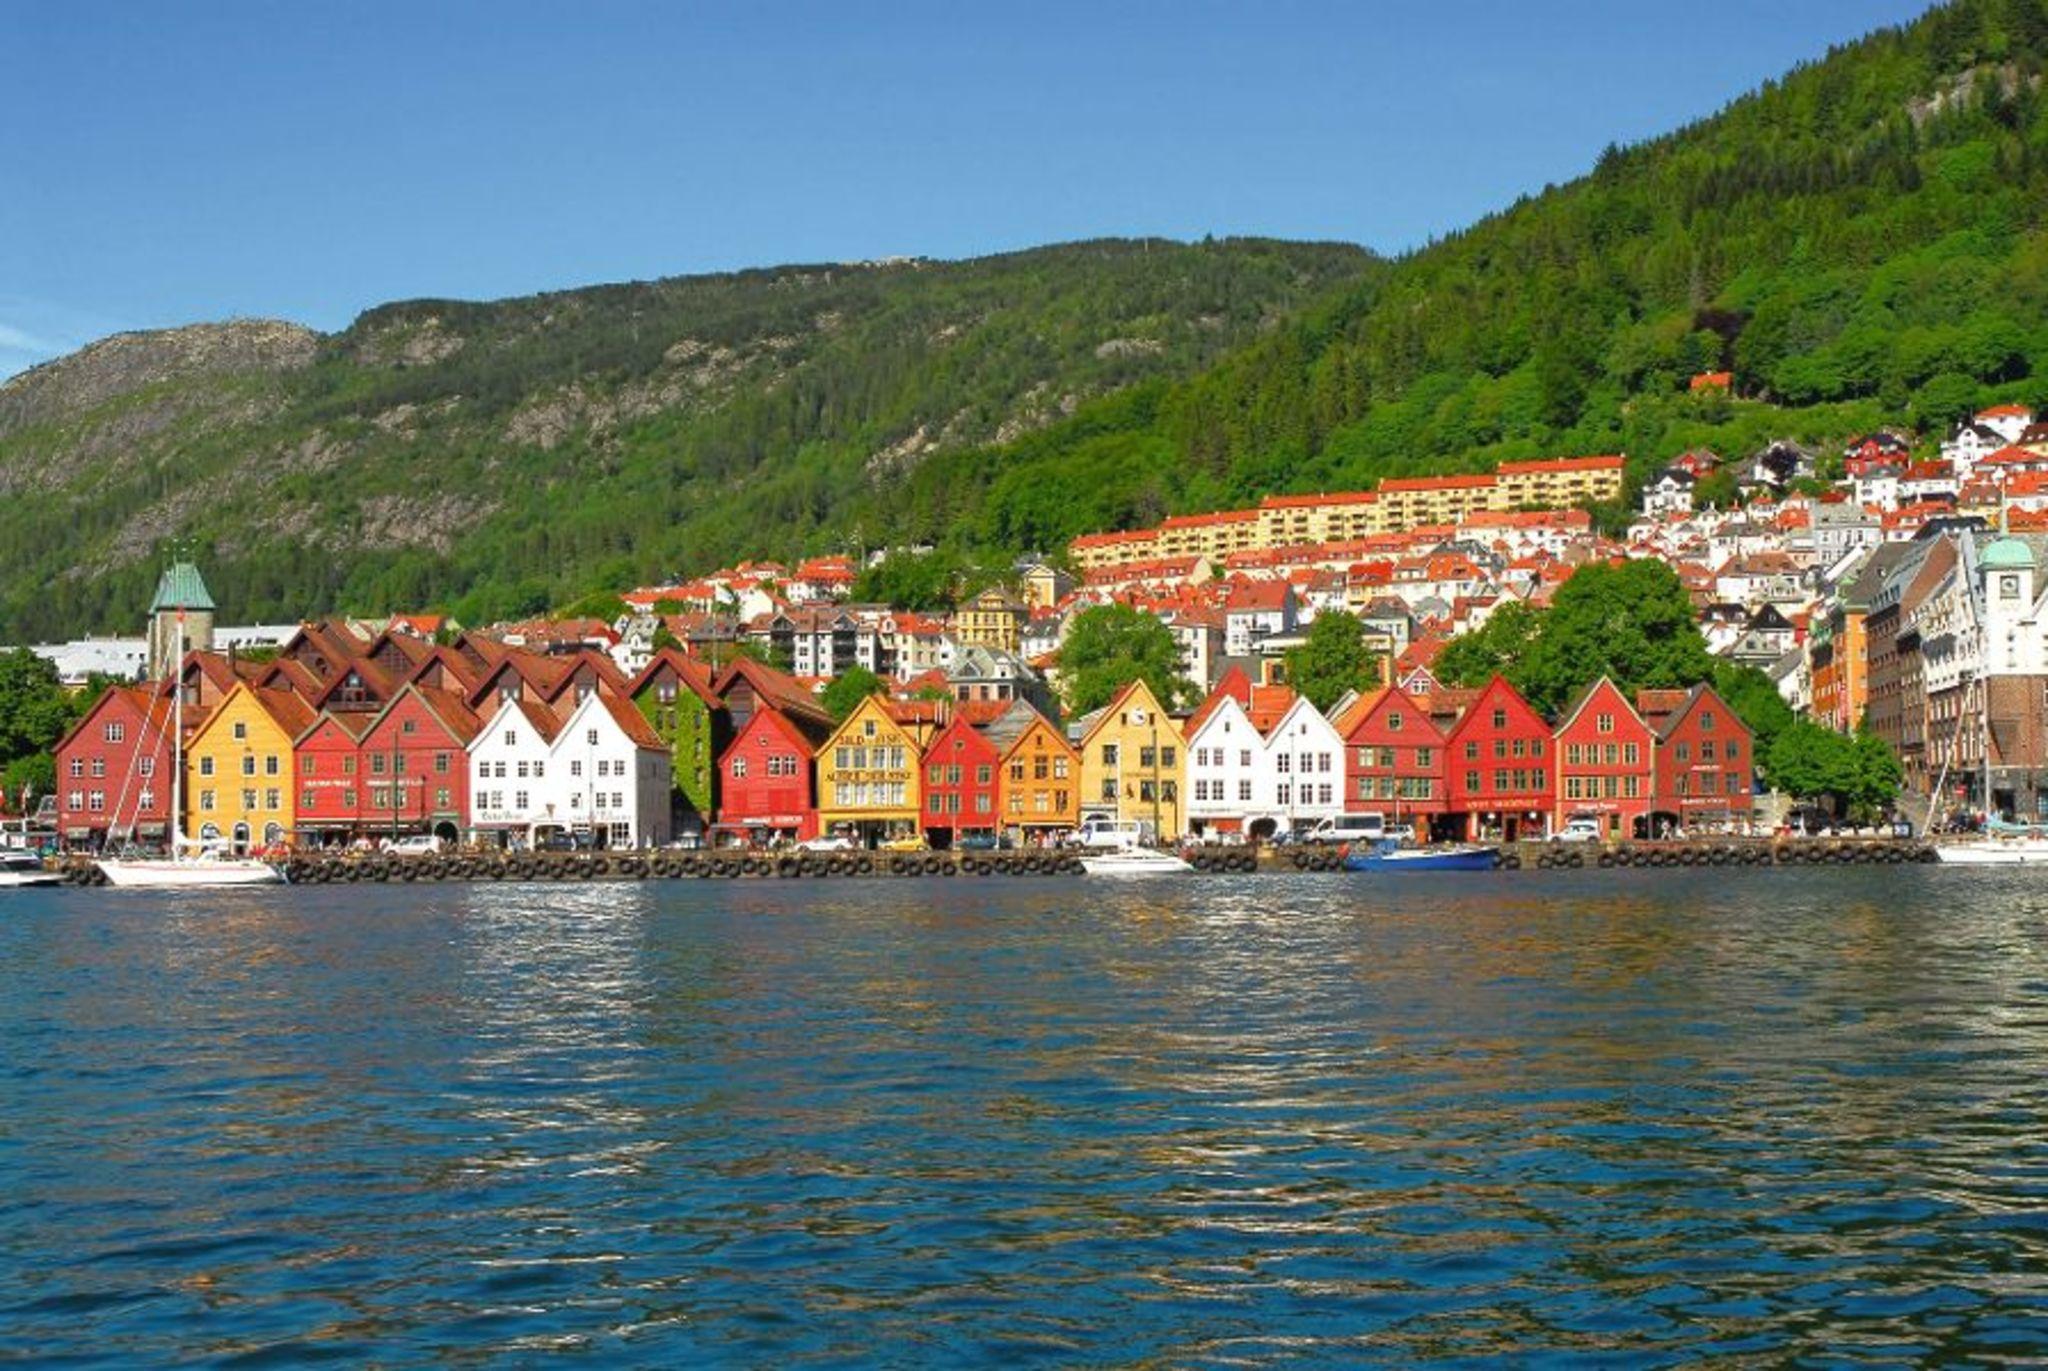 Nordkap Mit 5 Tagen Hurtigruten Kreuzfahrt Skandinavien